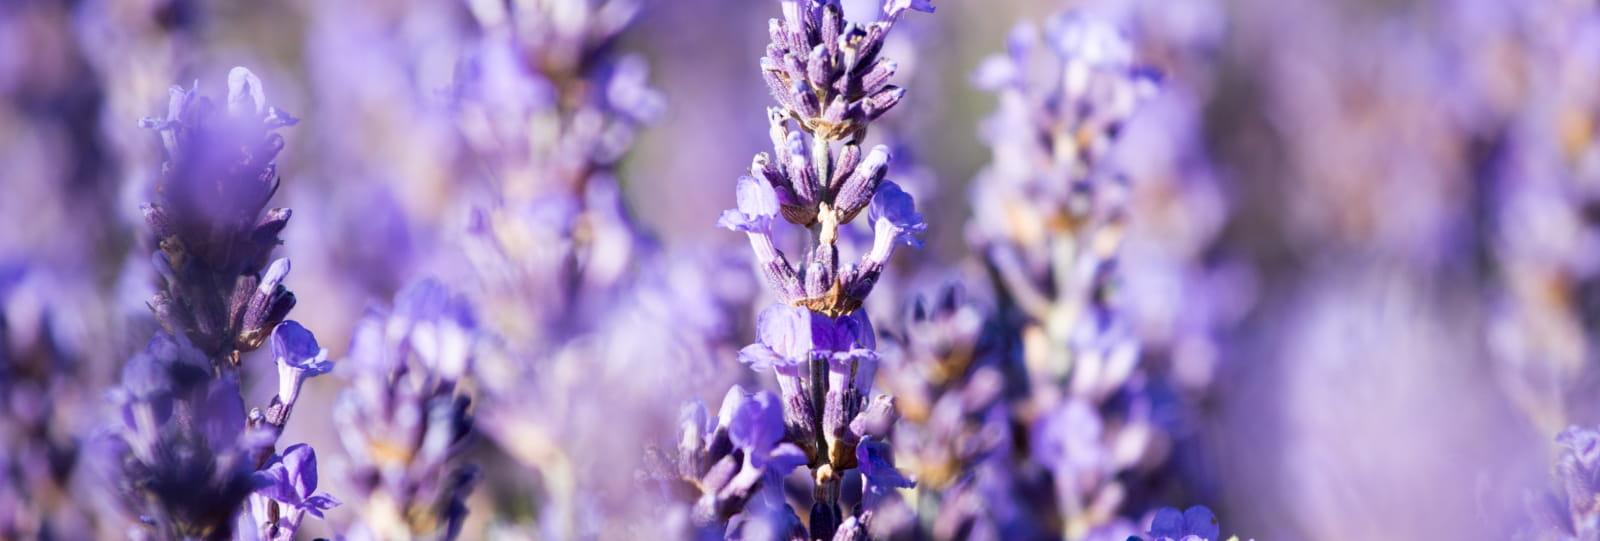 Plants & Wellness : Nyons / Buis-les-Baronnies